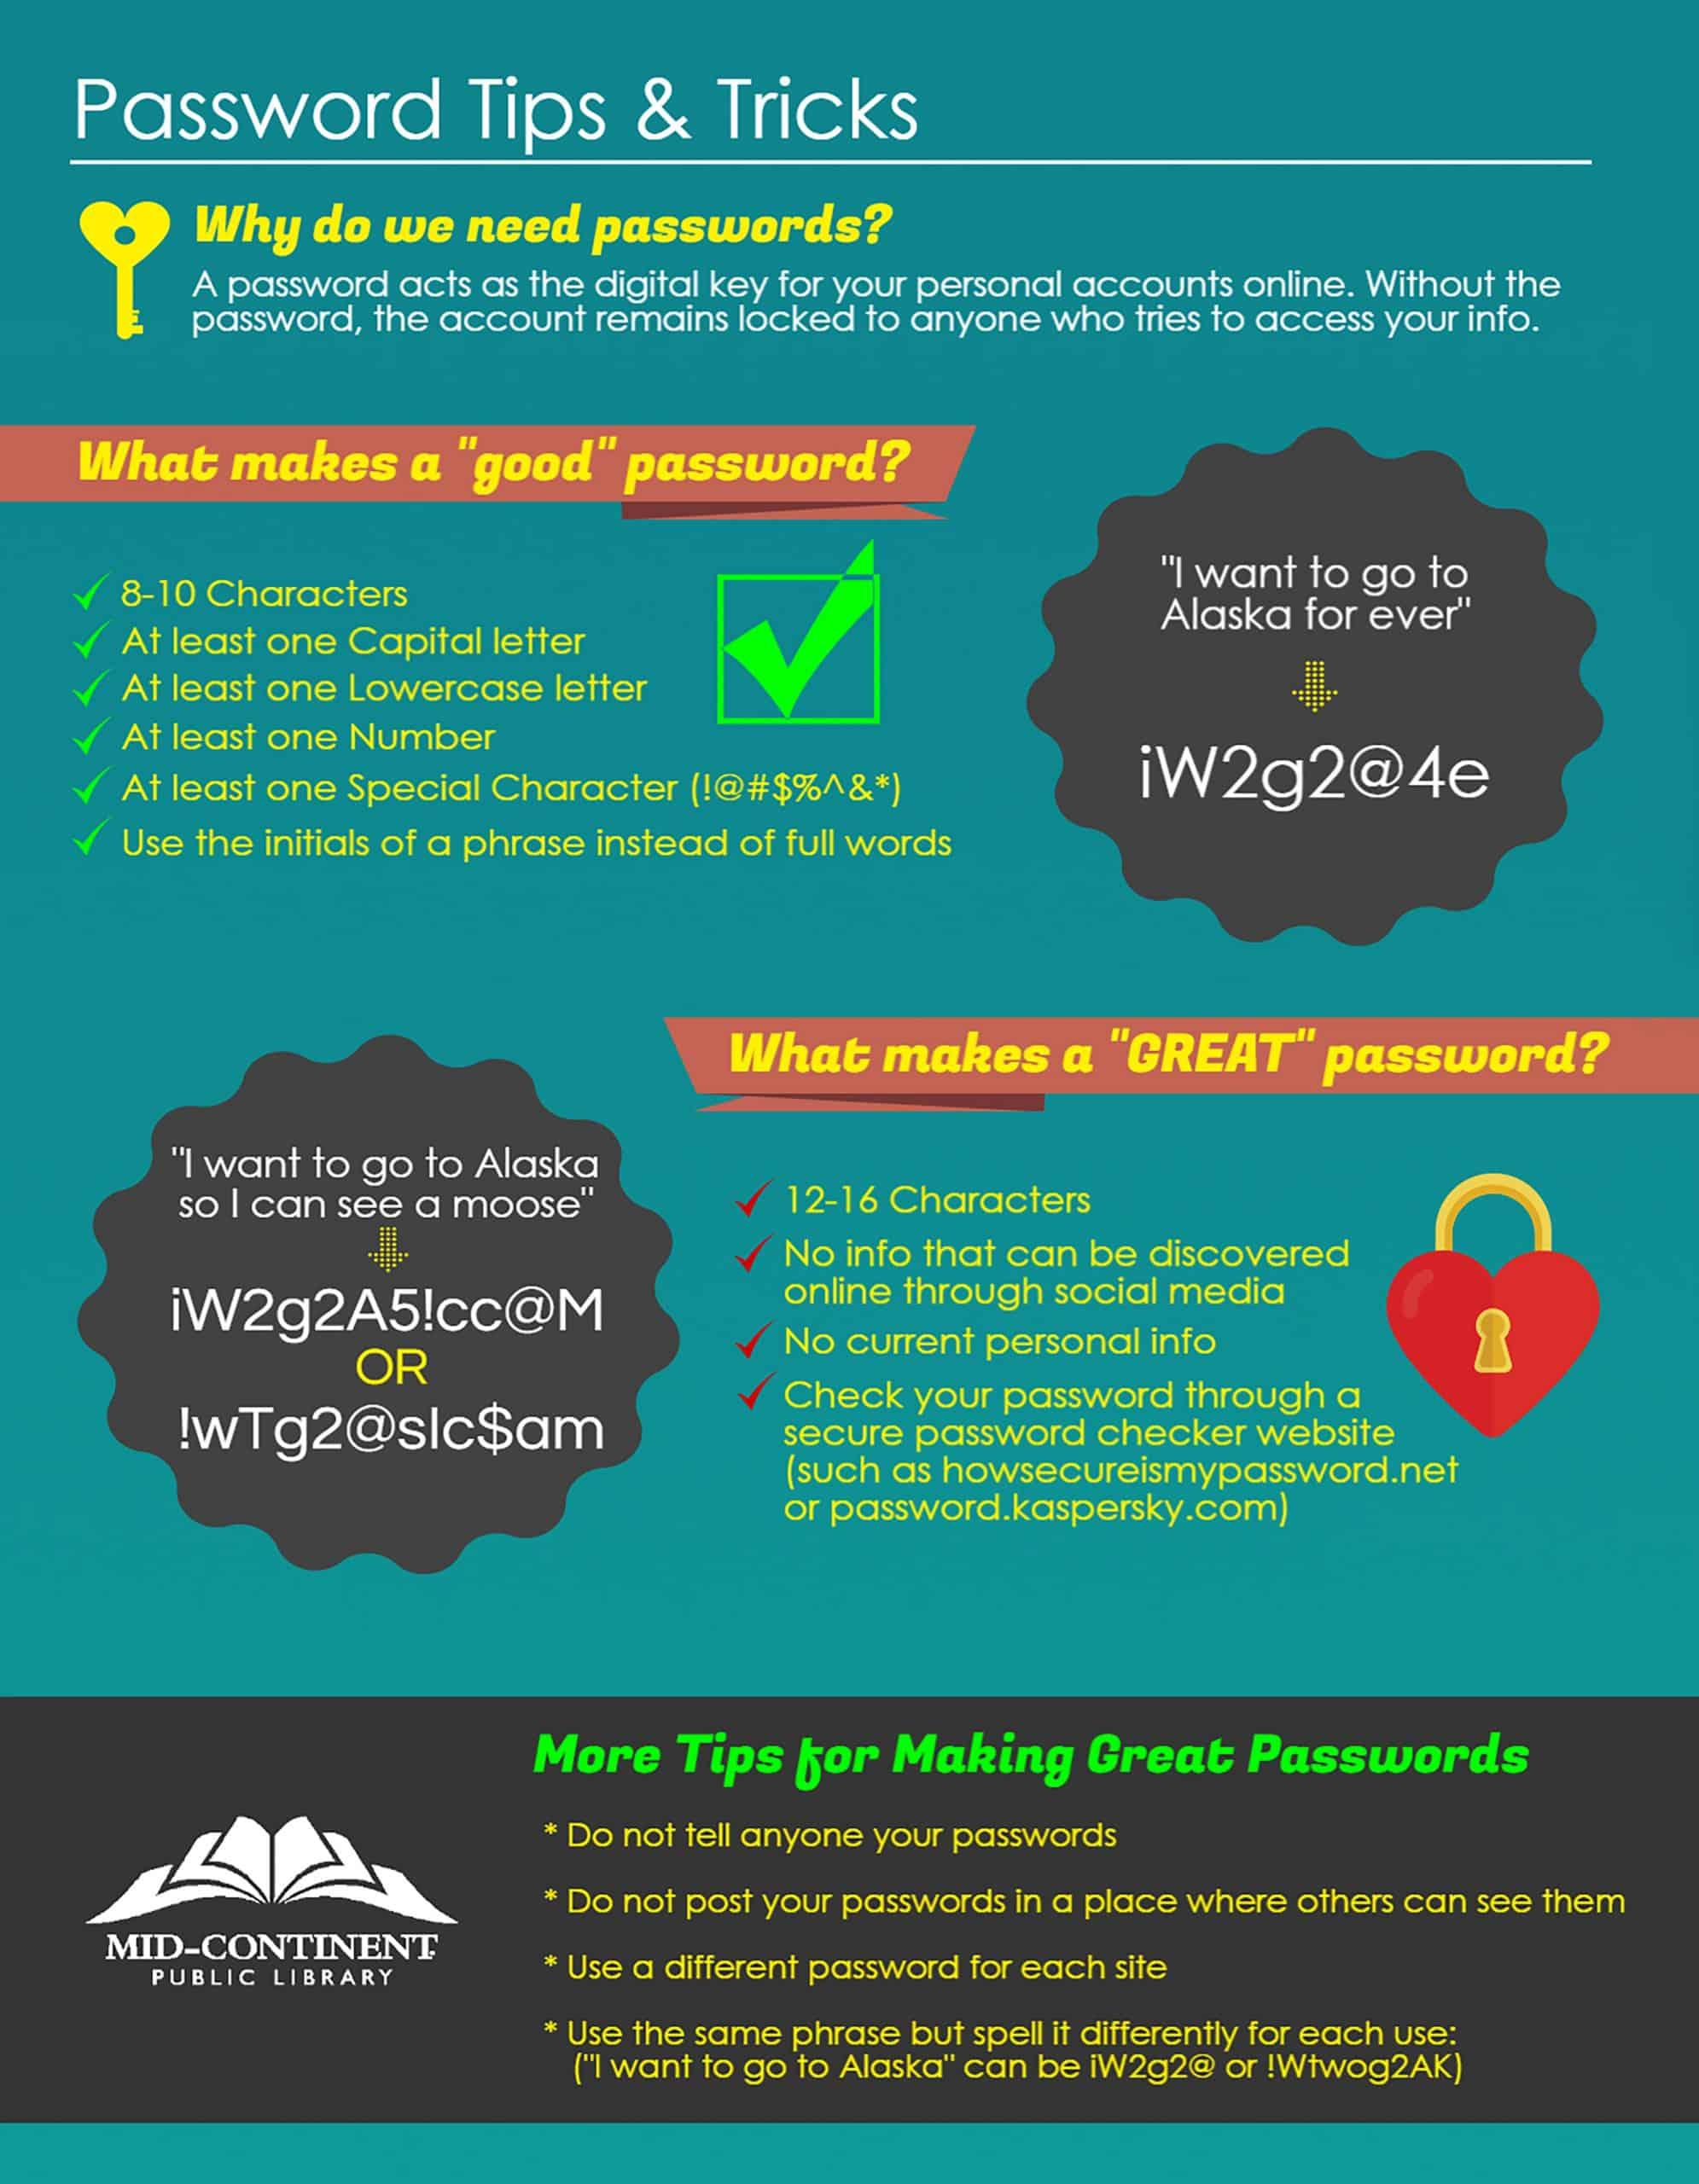 Password Tips & Tricks